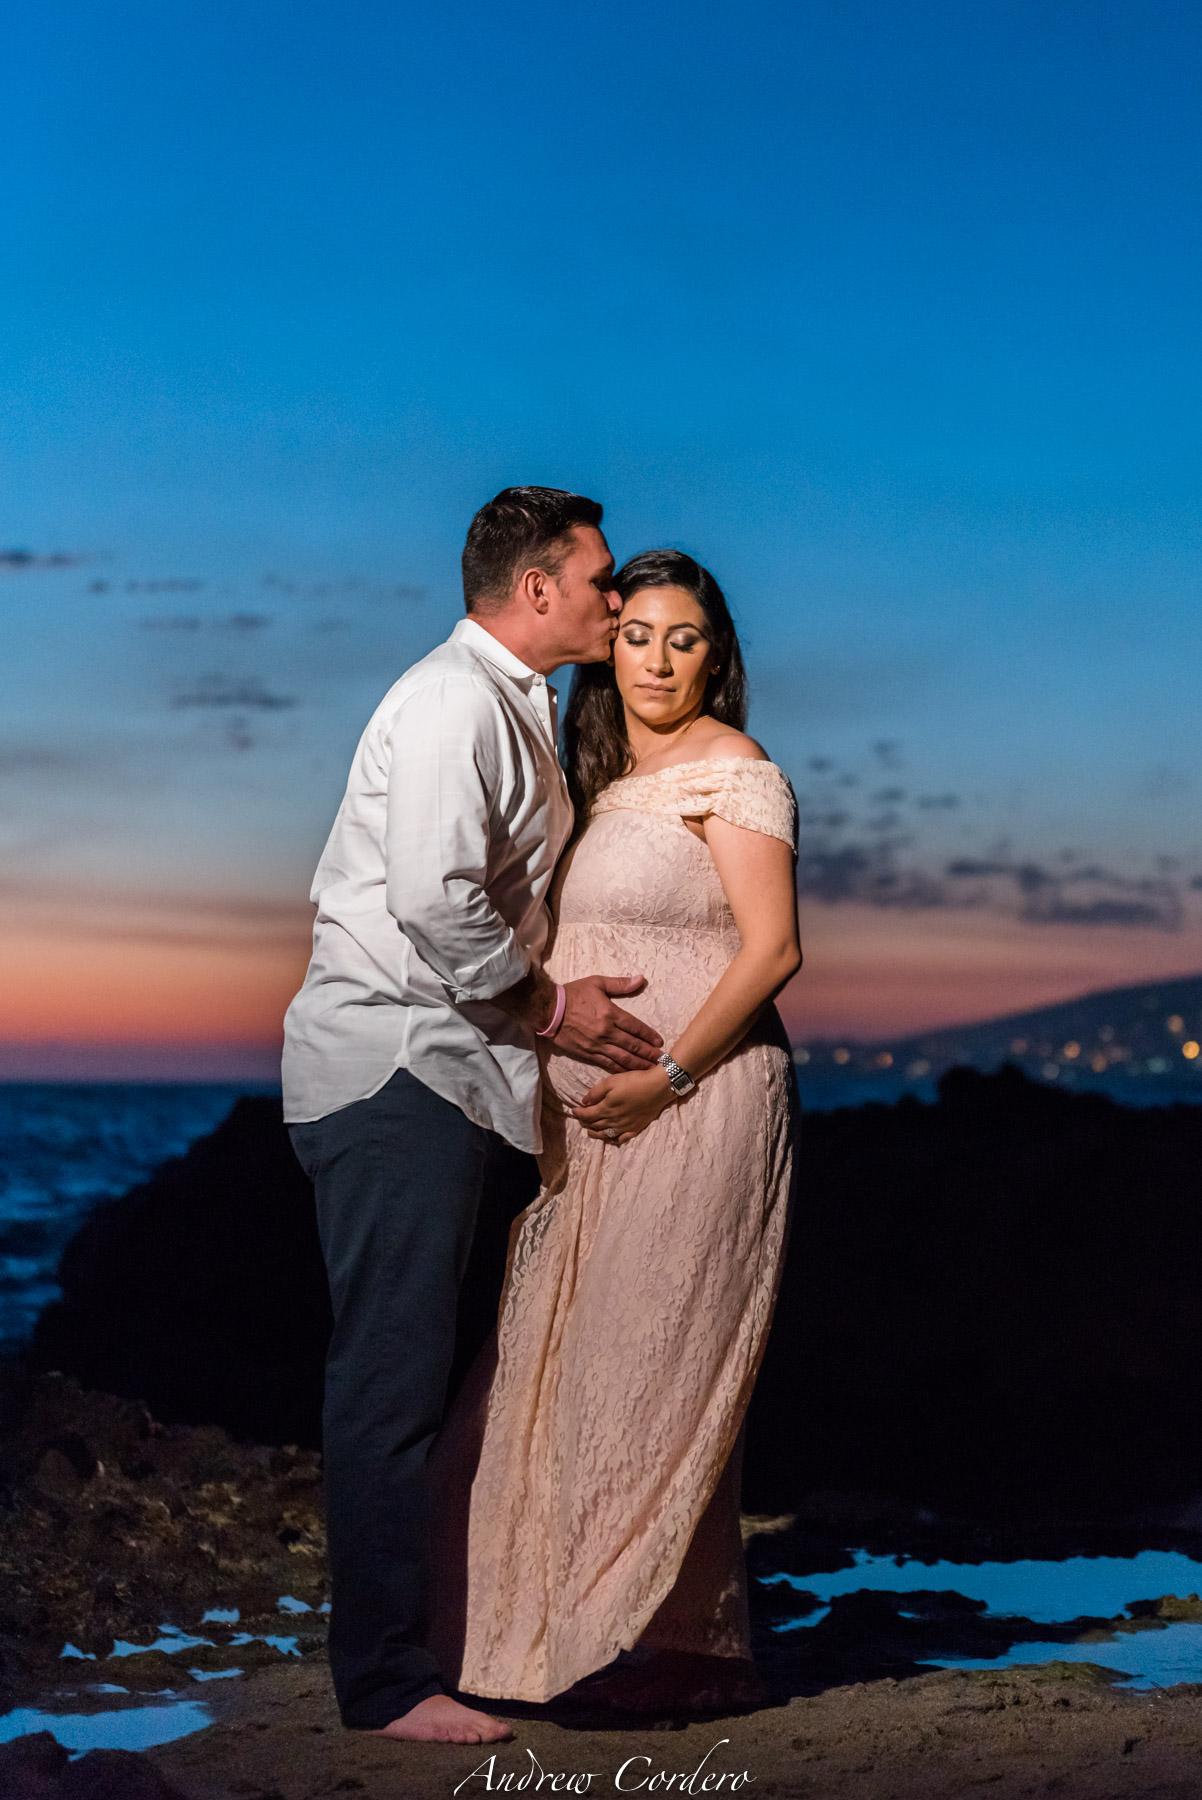 Laguna-Beach-Maternity-session-Lily-and-Erick-9986.JPG